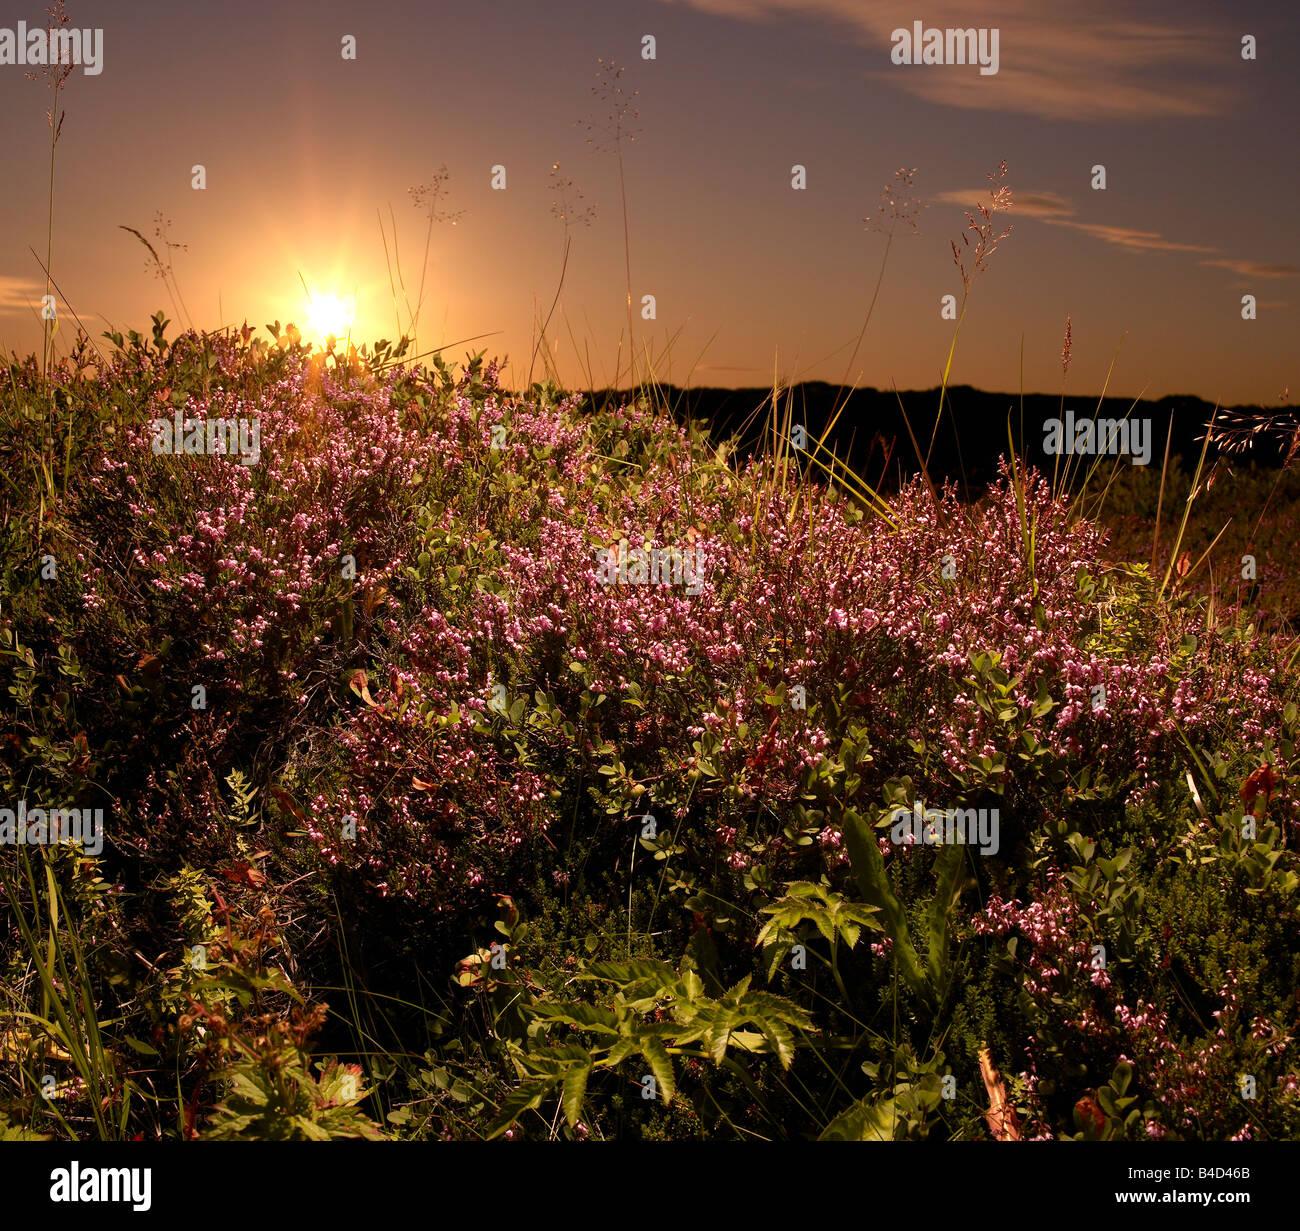 Midnight Sunset with wild flowers growing over Lava,  Reykjanes Peninsula, Iceland - Stock Image